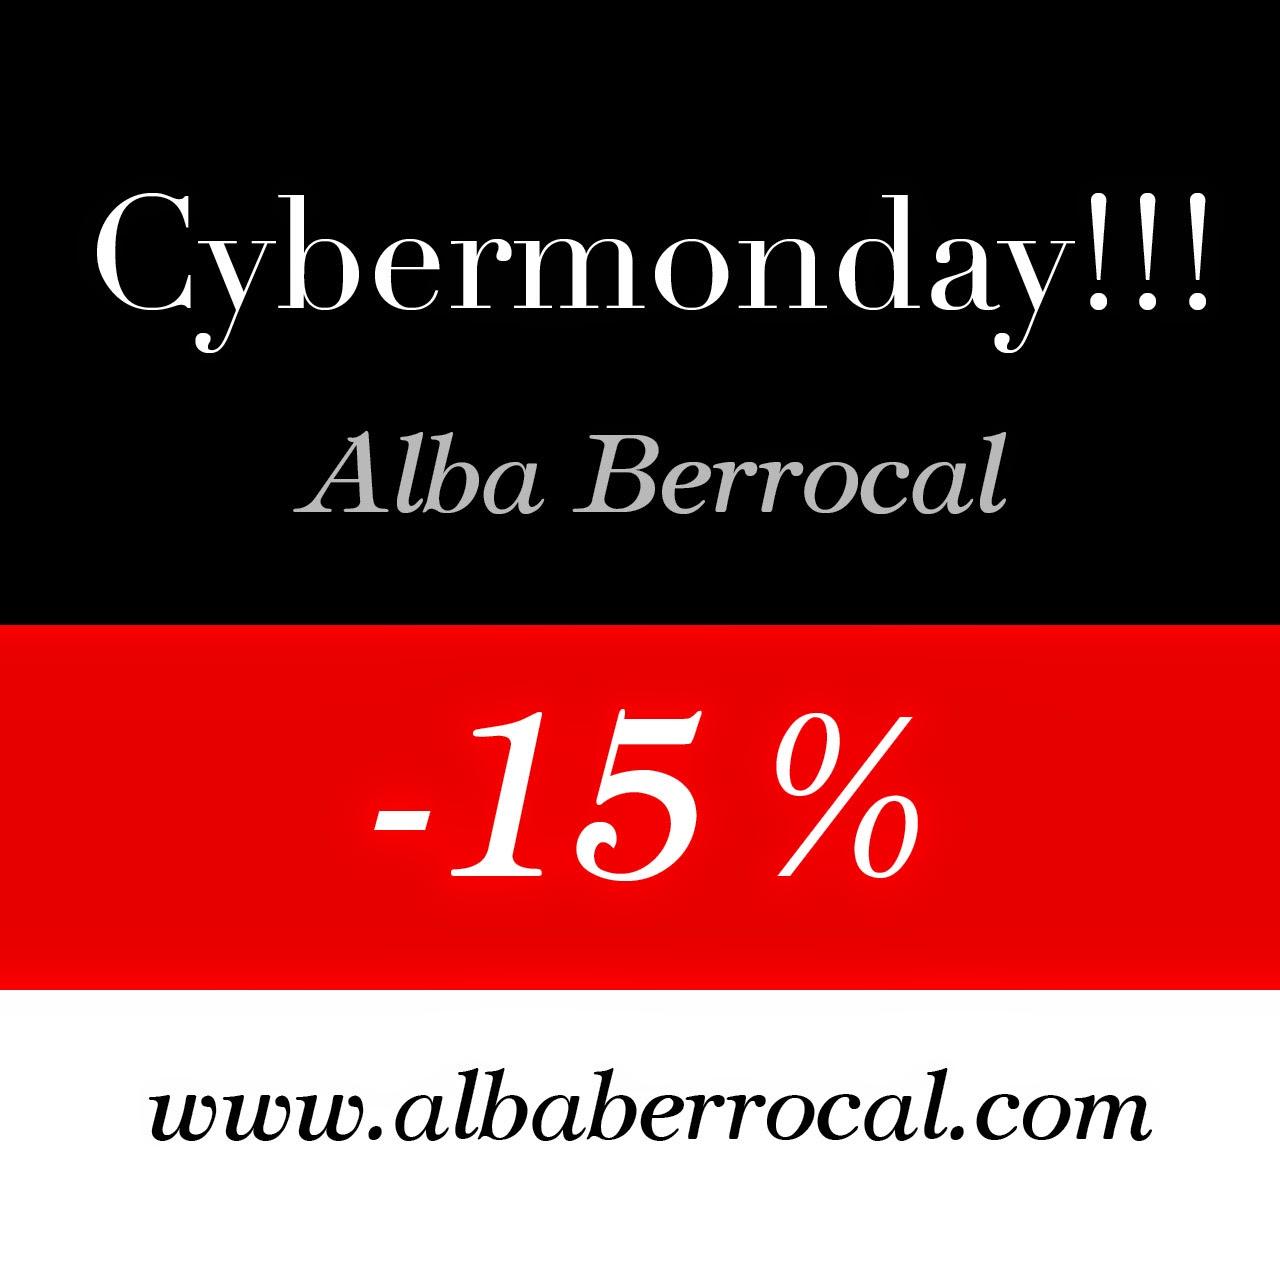 Cybermonday. 1 Diciembre 2014